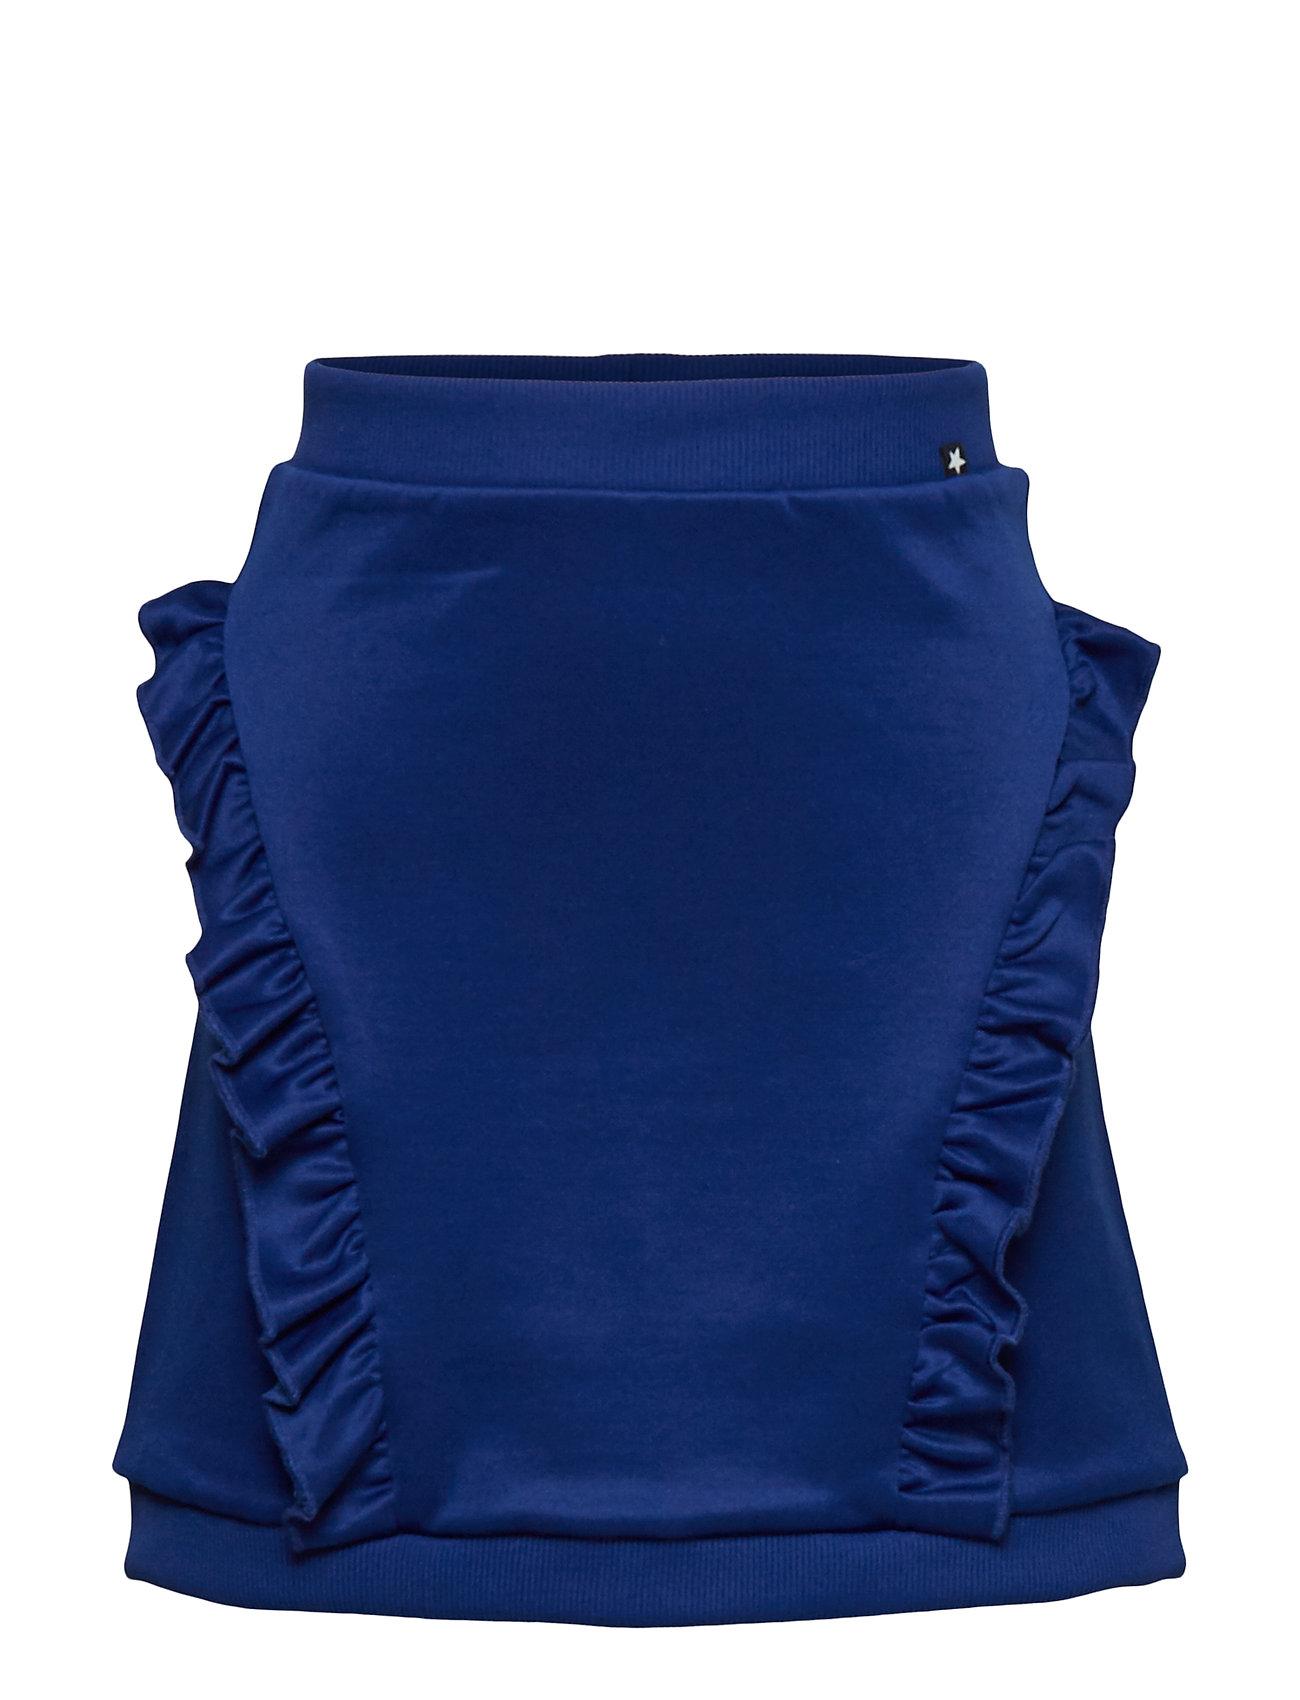 Molo Beverly - LAPIS BLUE